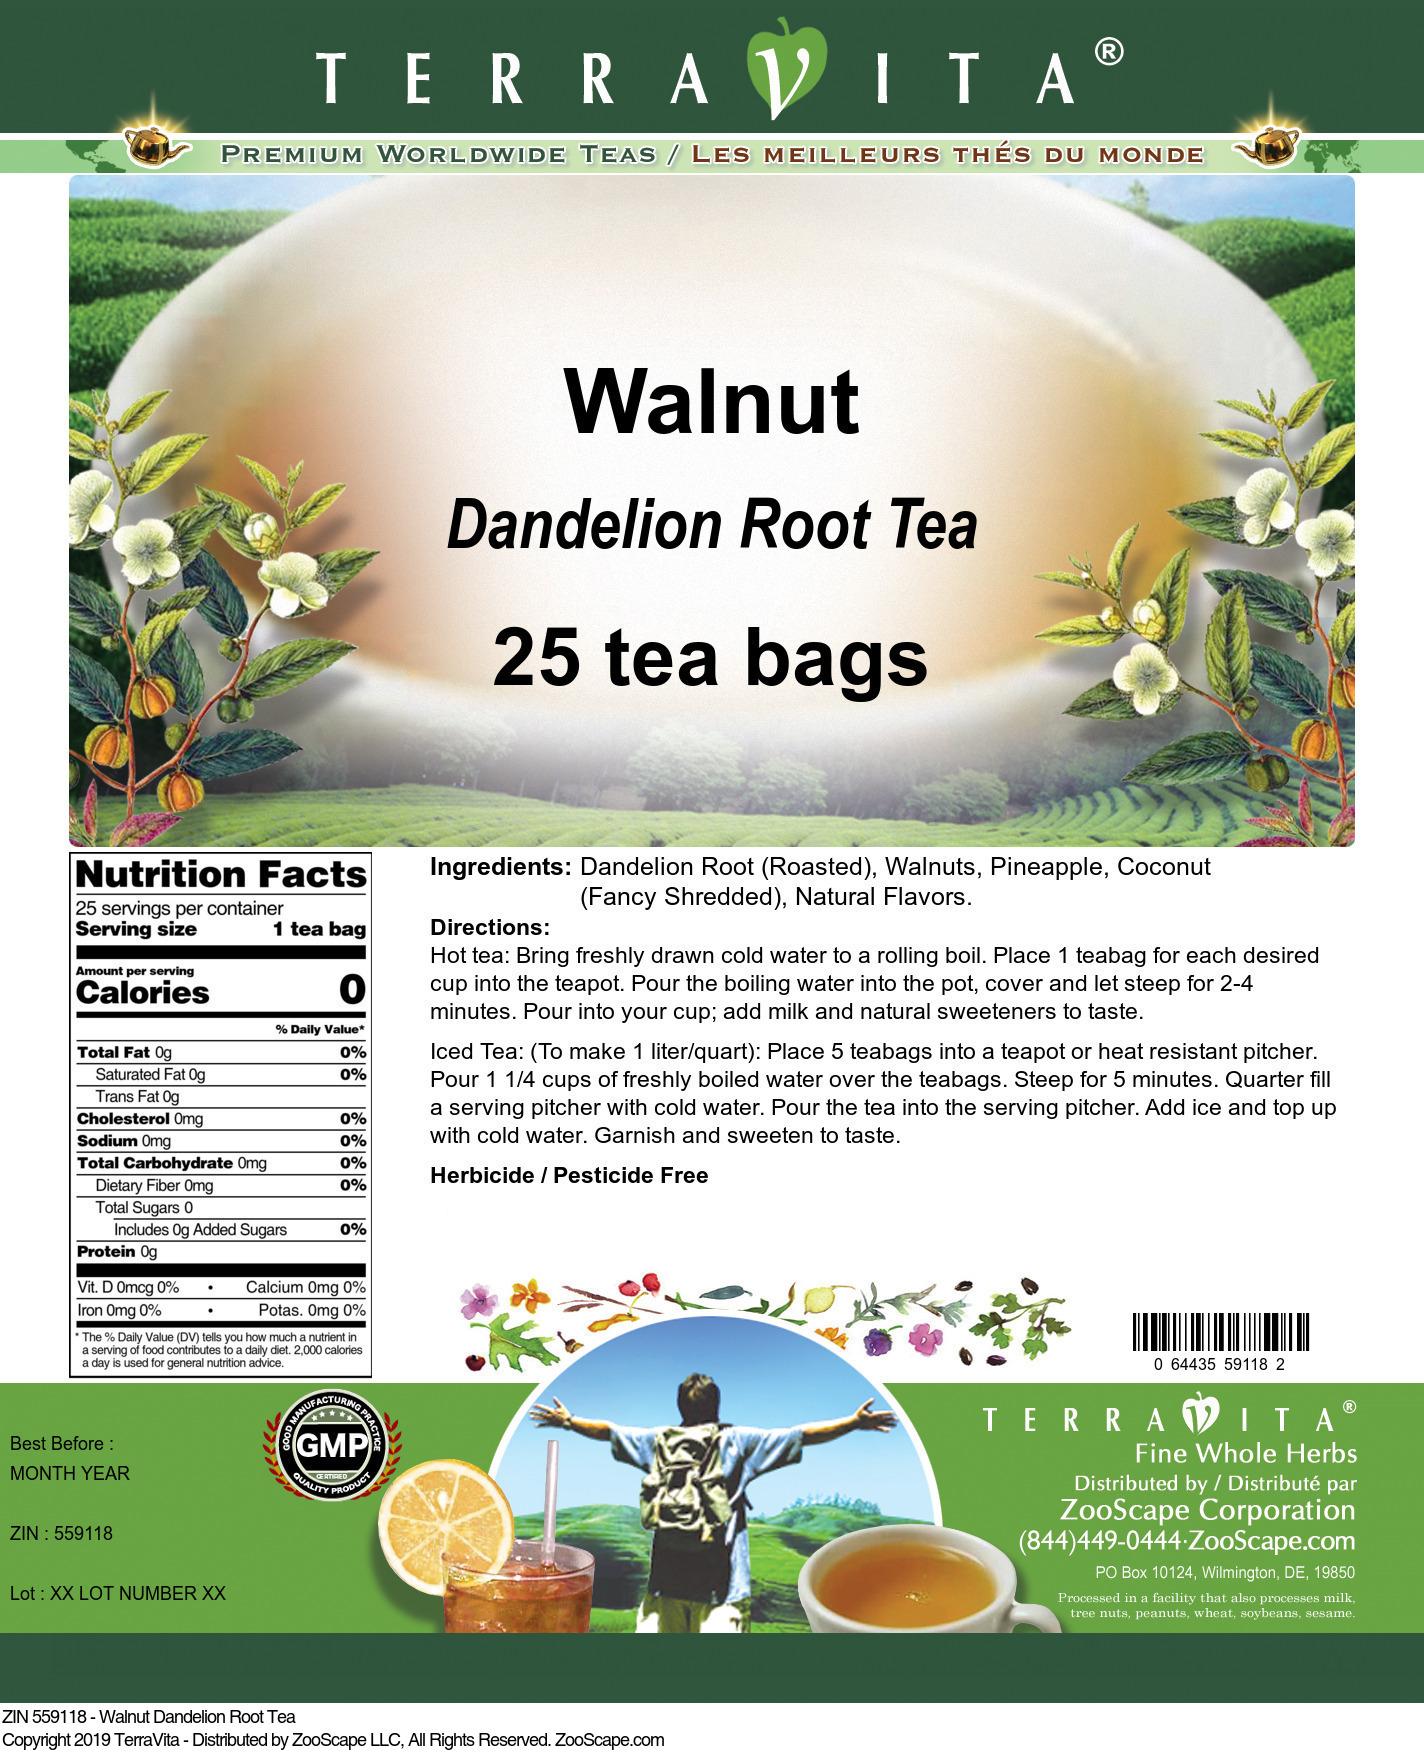 Walnut Dandelion Root Tea